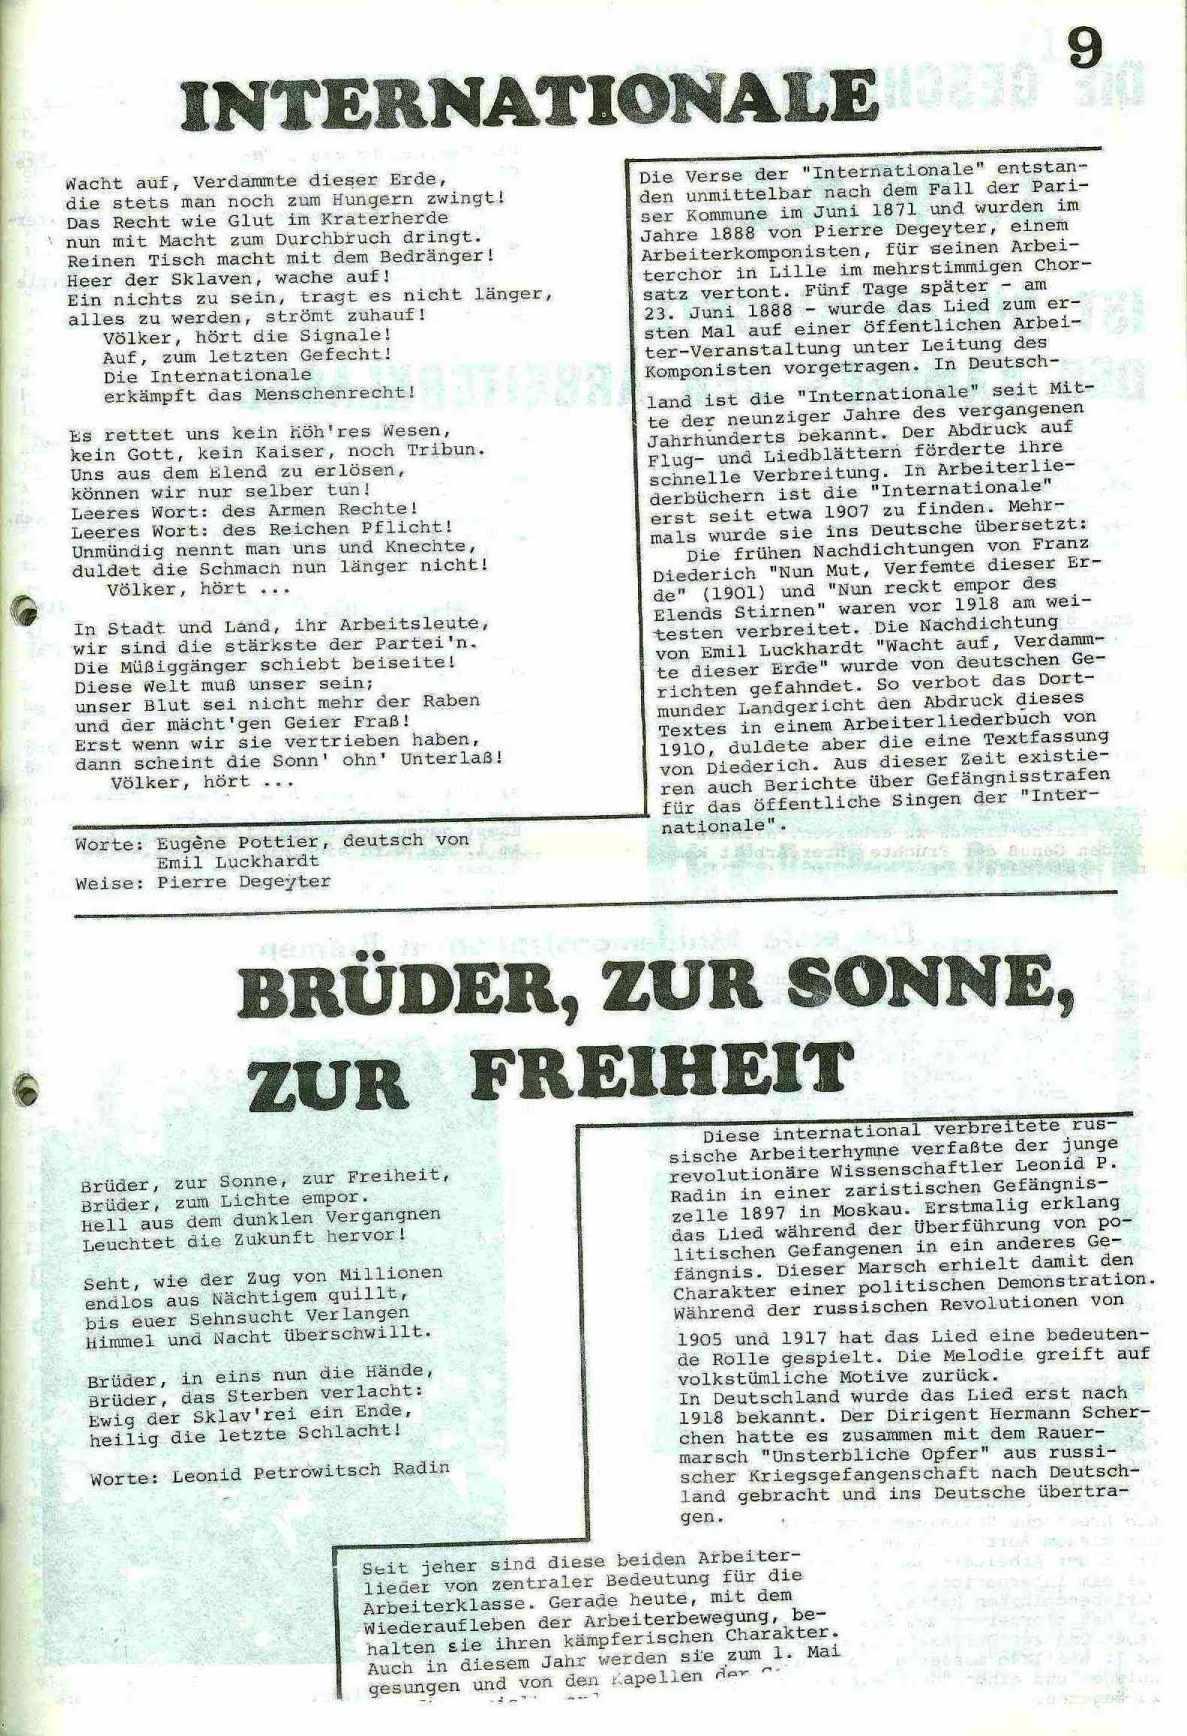 Bremen_KAK075